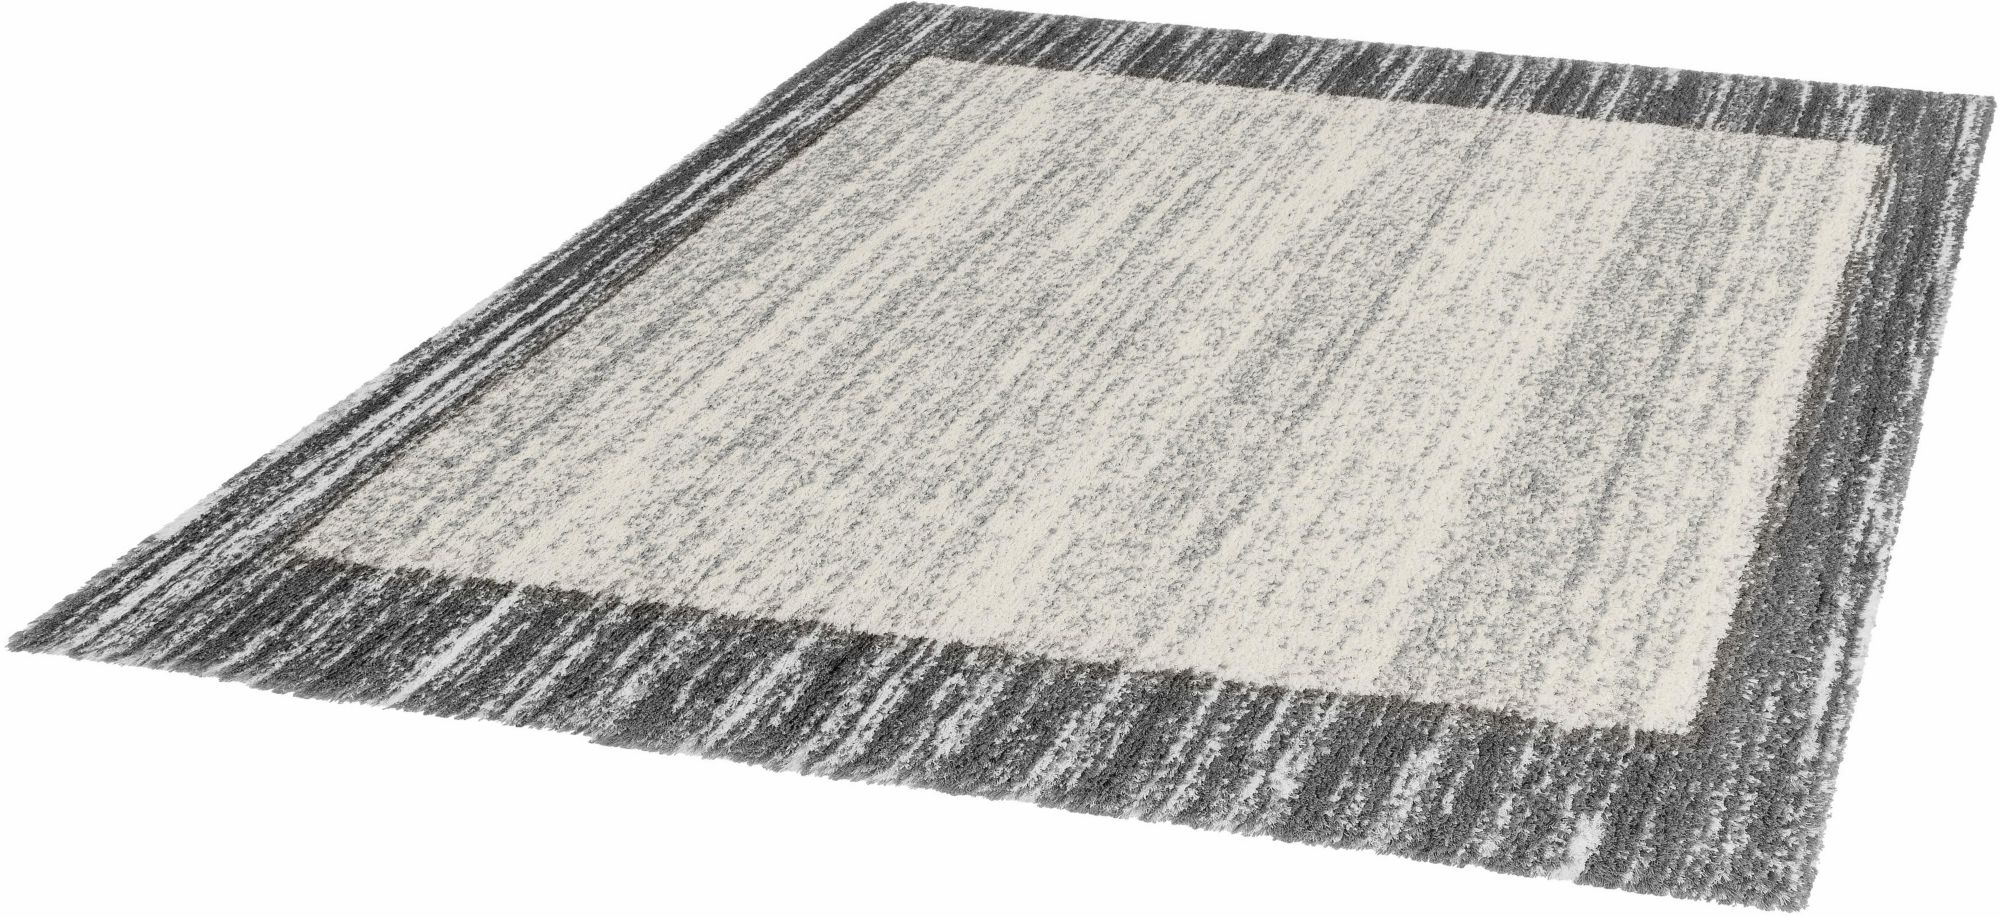 ASTRA Hochflor-Teppich, Astra, »Rivoli 173«, Höhe 30 mm, gewebt